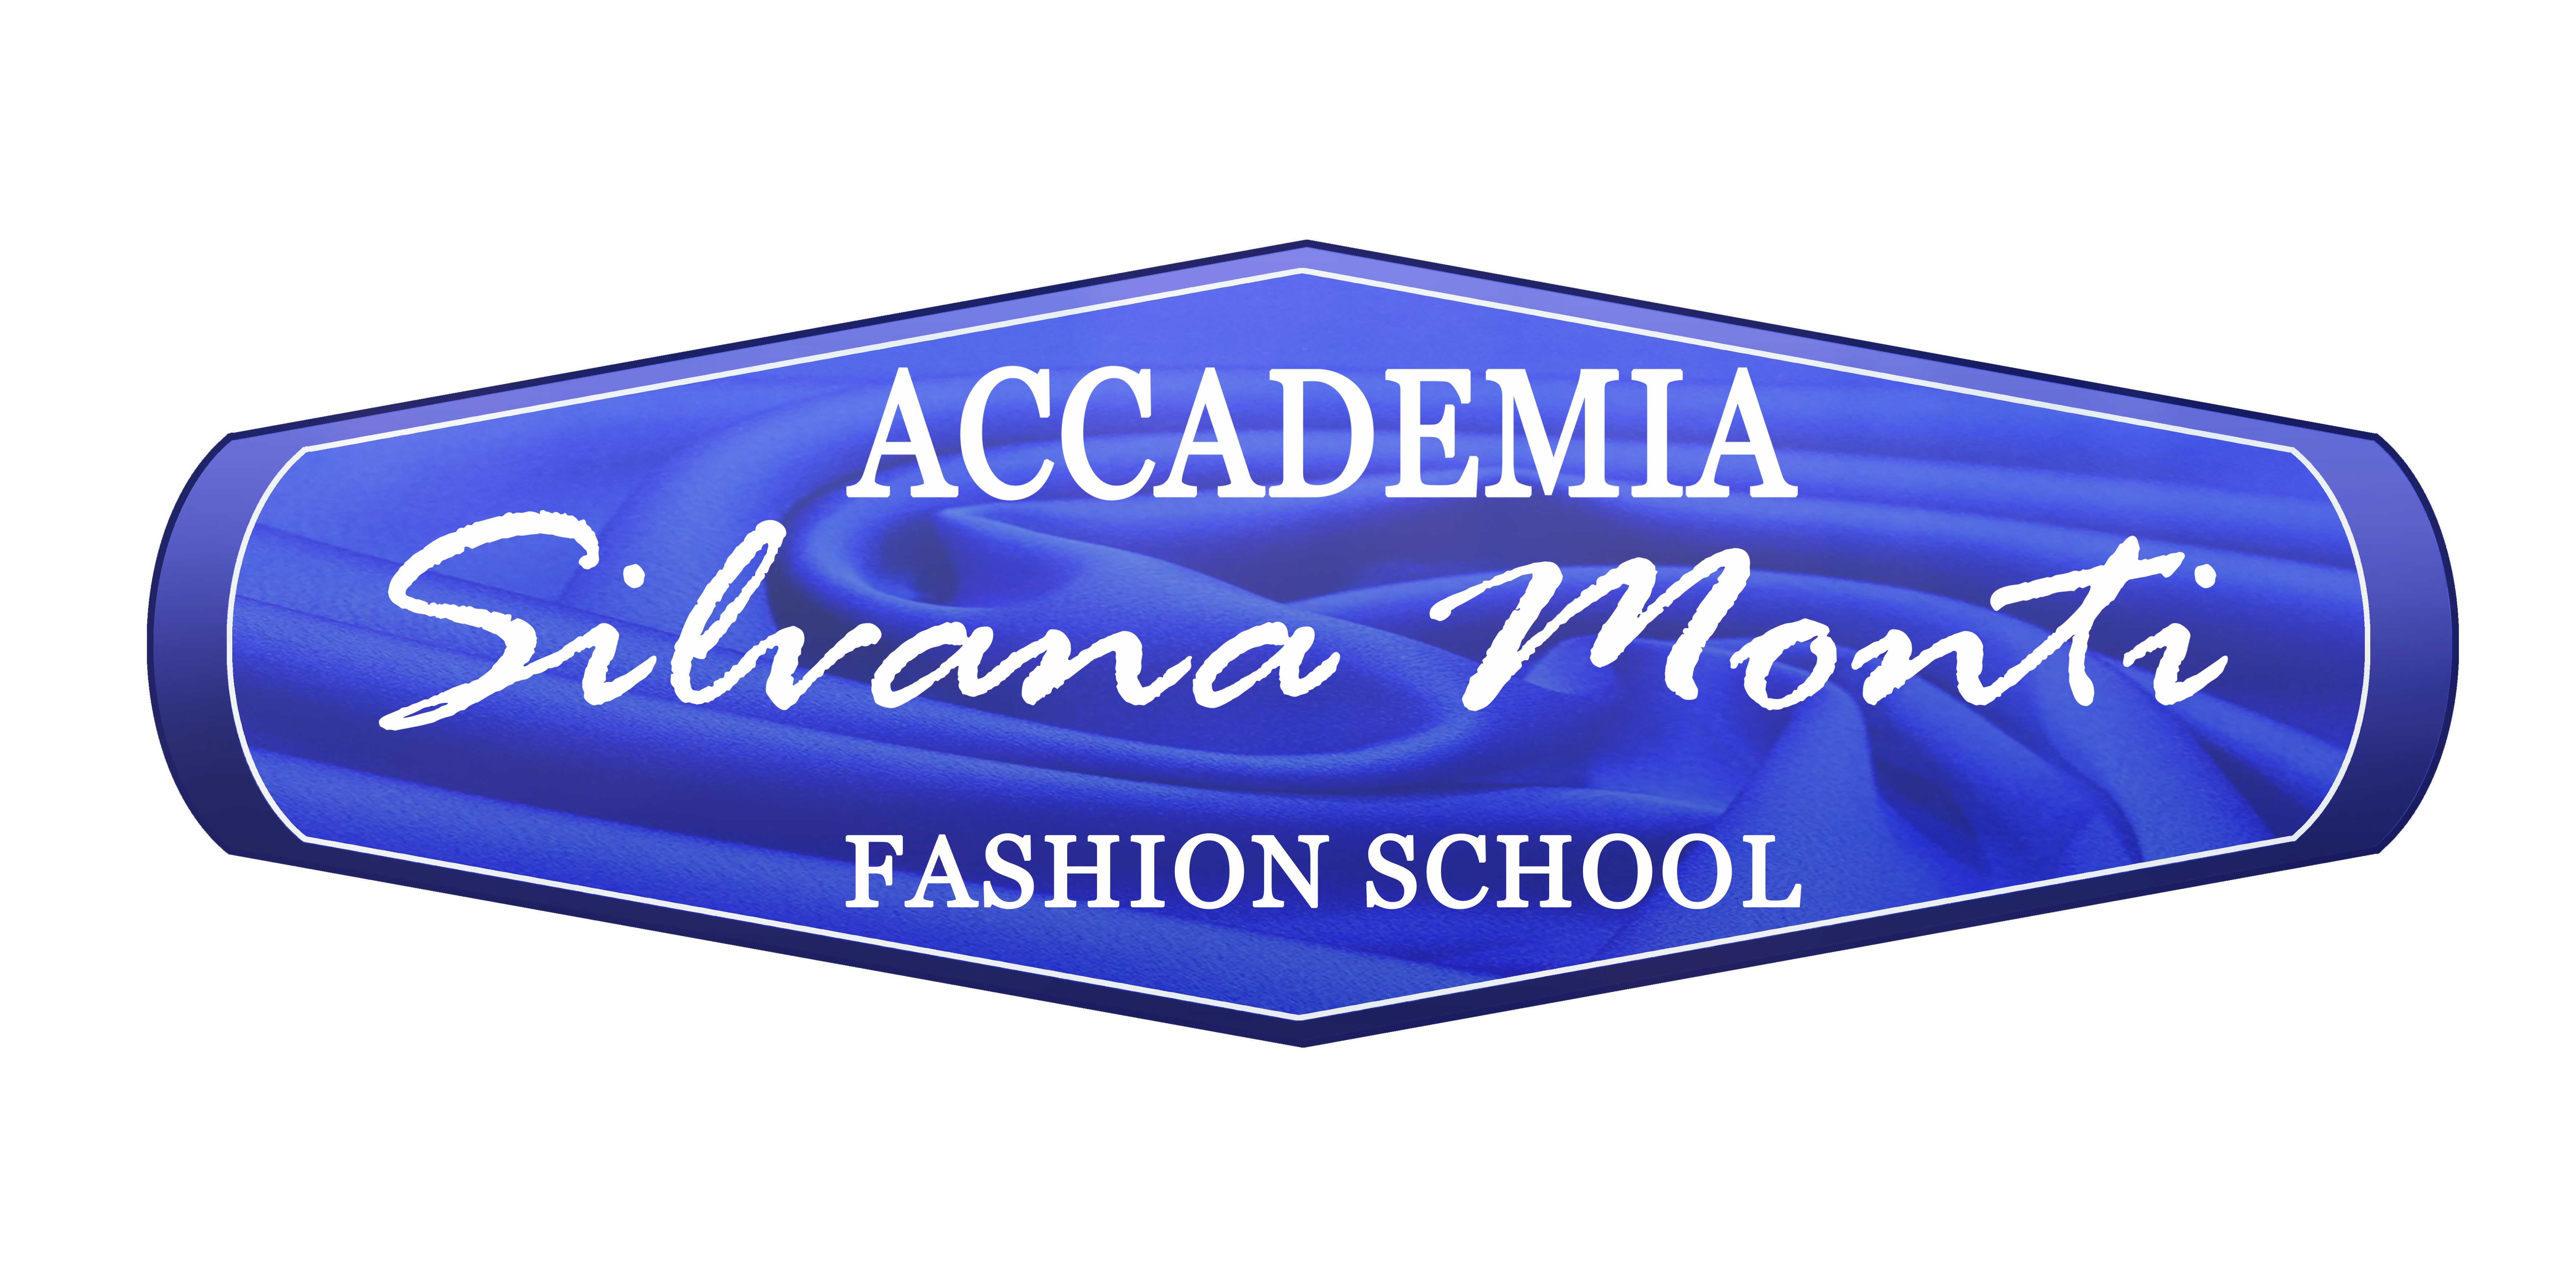 Accademia Silvana Monti